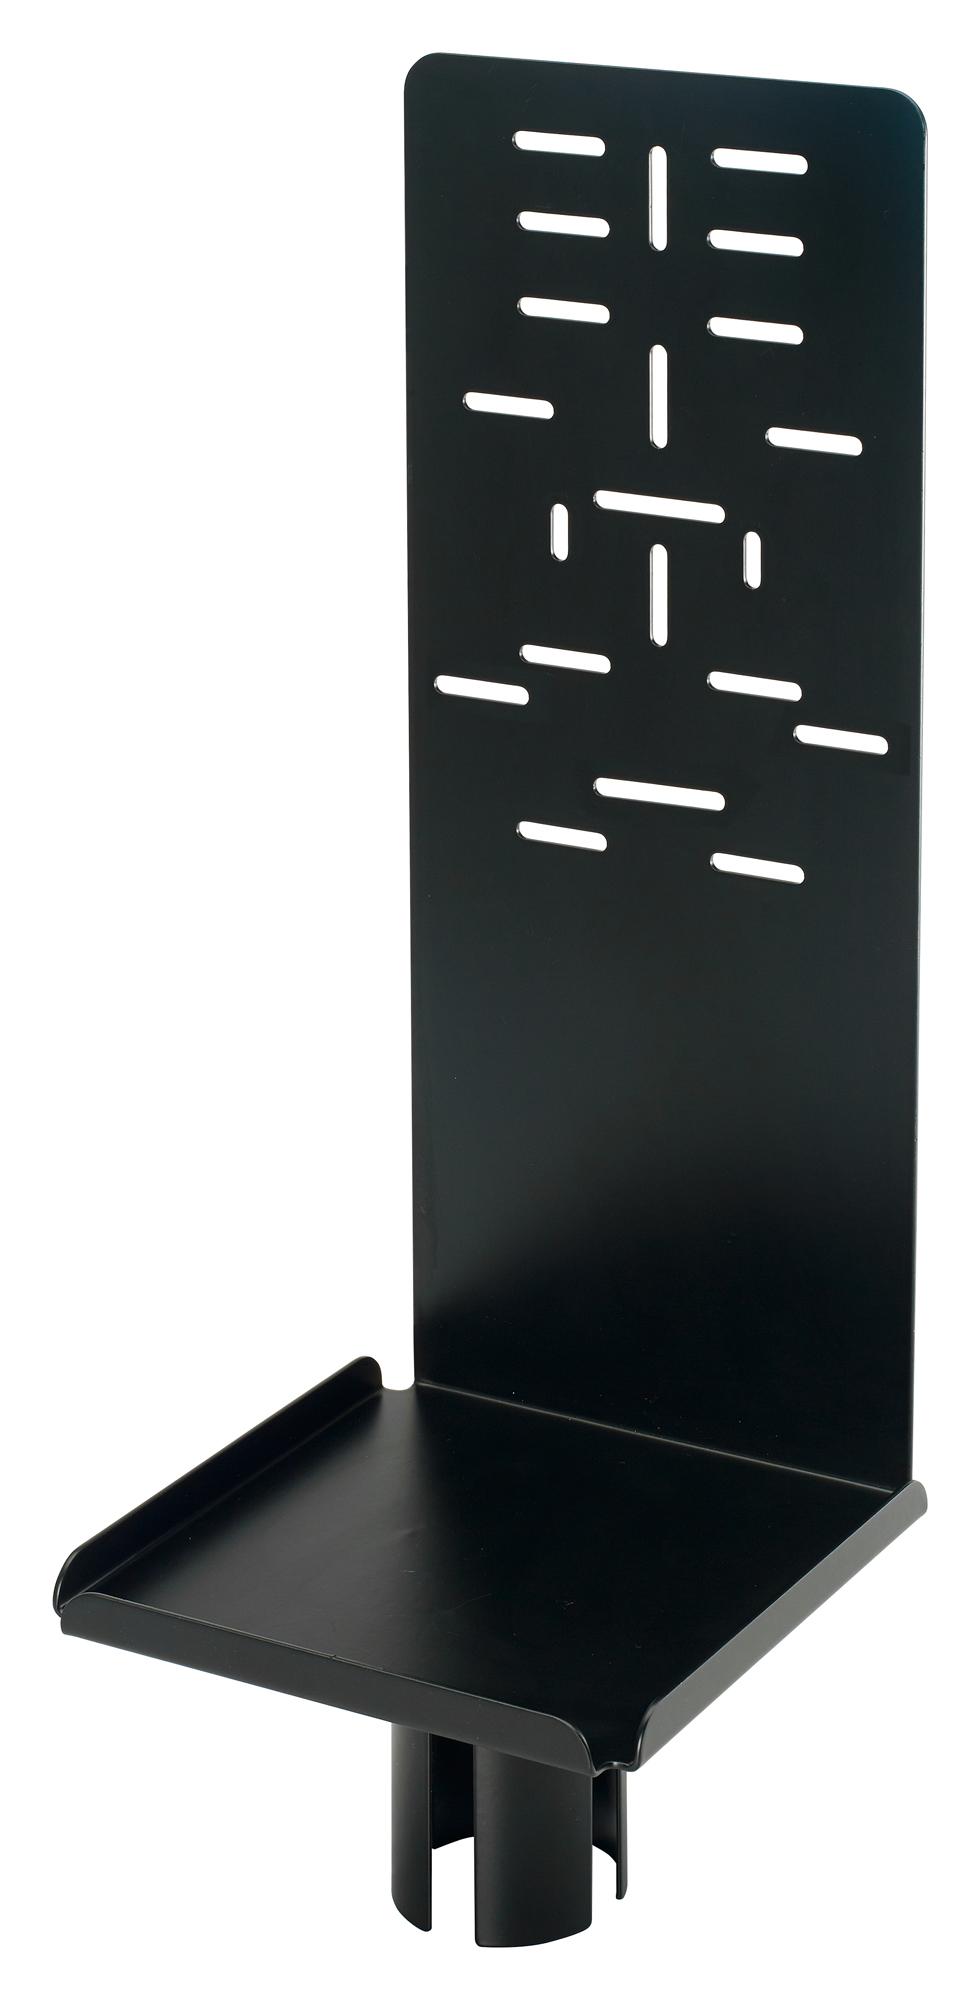 Winco SMSD-16K mount universal sanitizer/soap dispenser